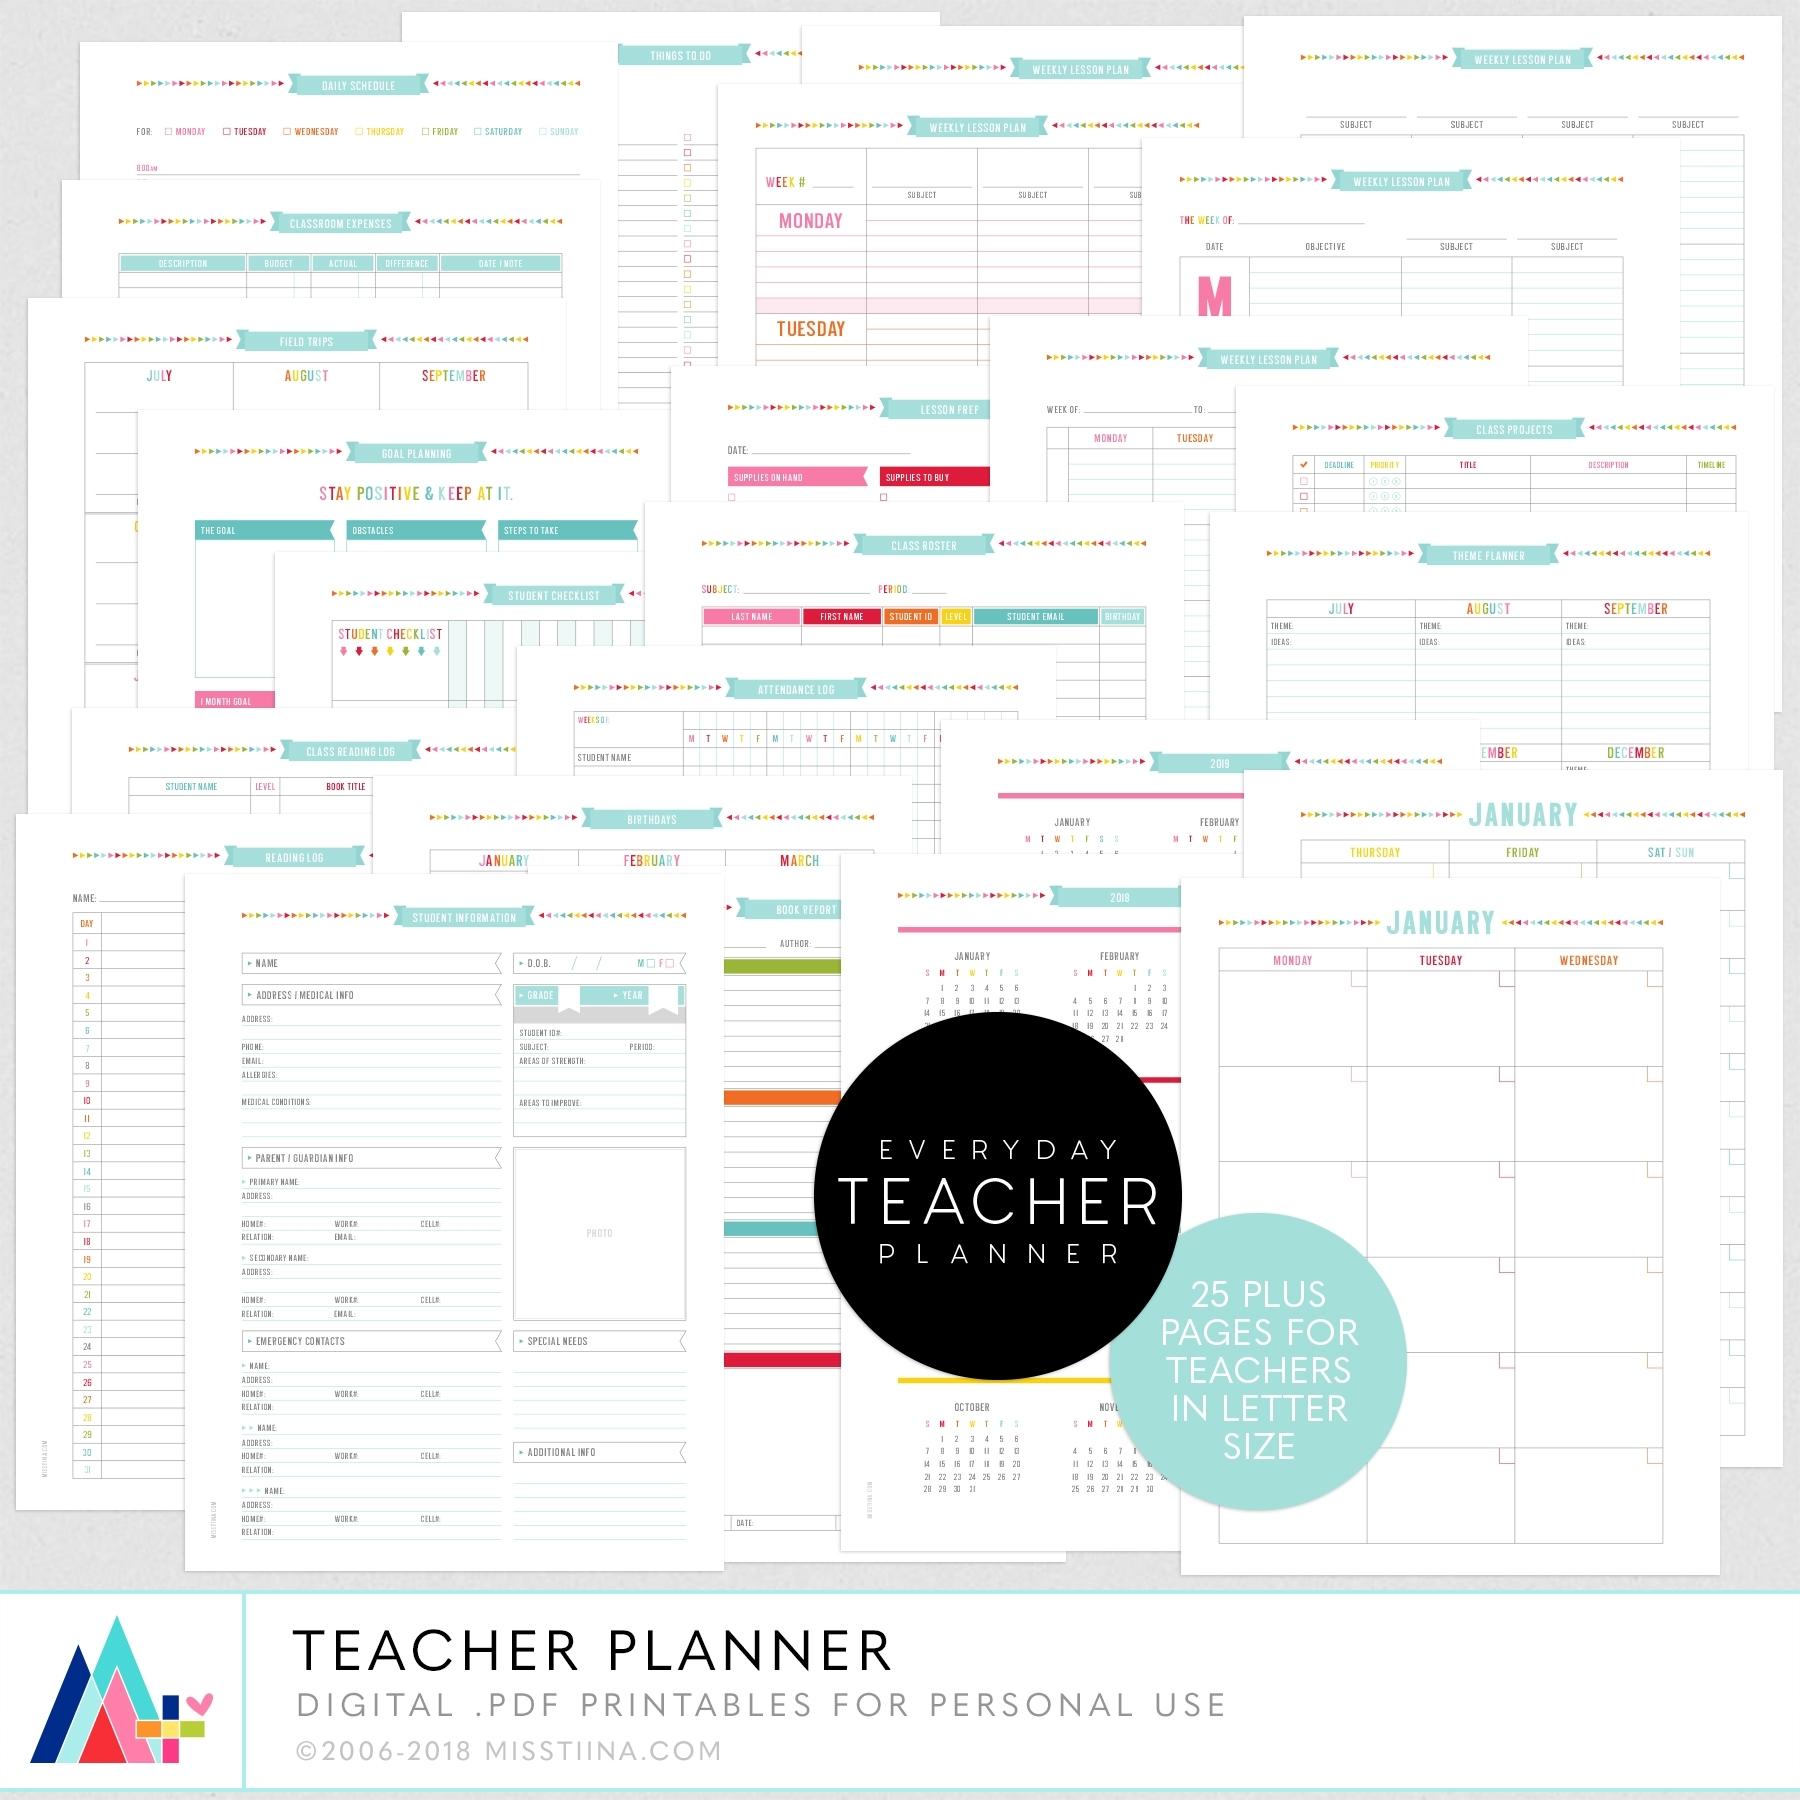 Teacher Planner By Miss Tiina | Misstiina